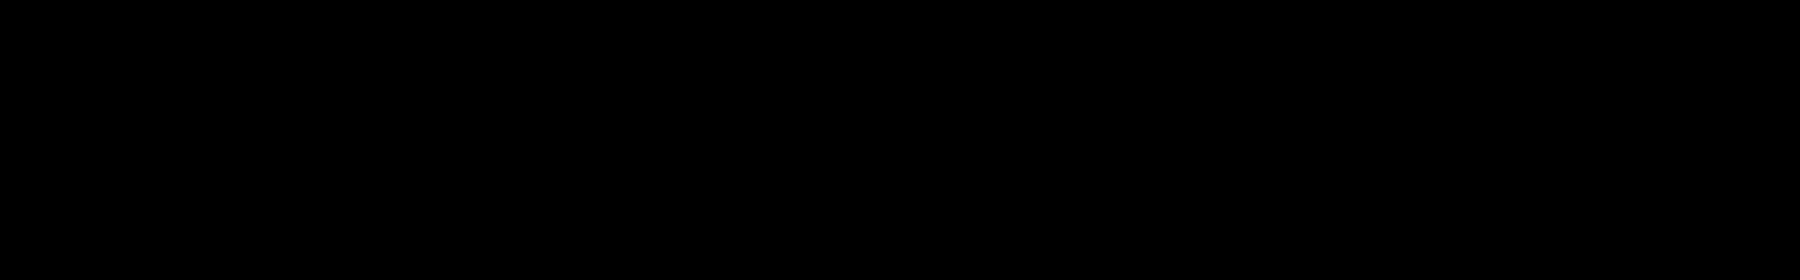 Torque 2 – Hybrid Trap audio waveform